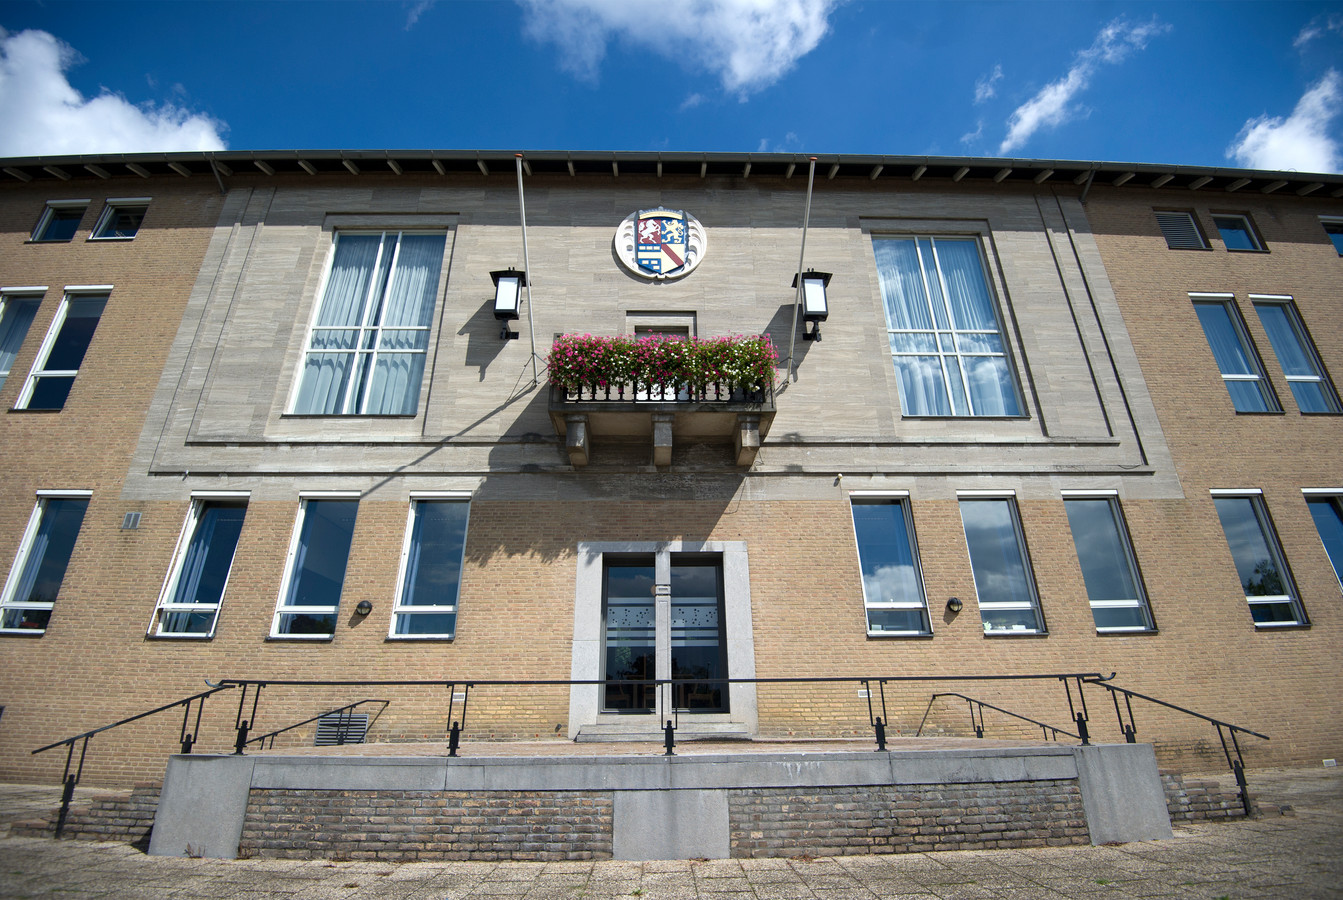 Het Renkumse gemeentehuis in Oosterbeek.